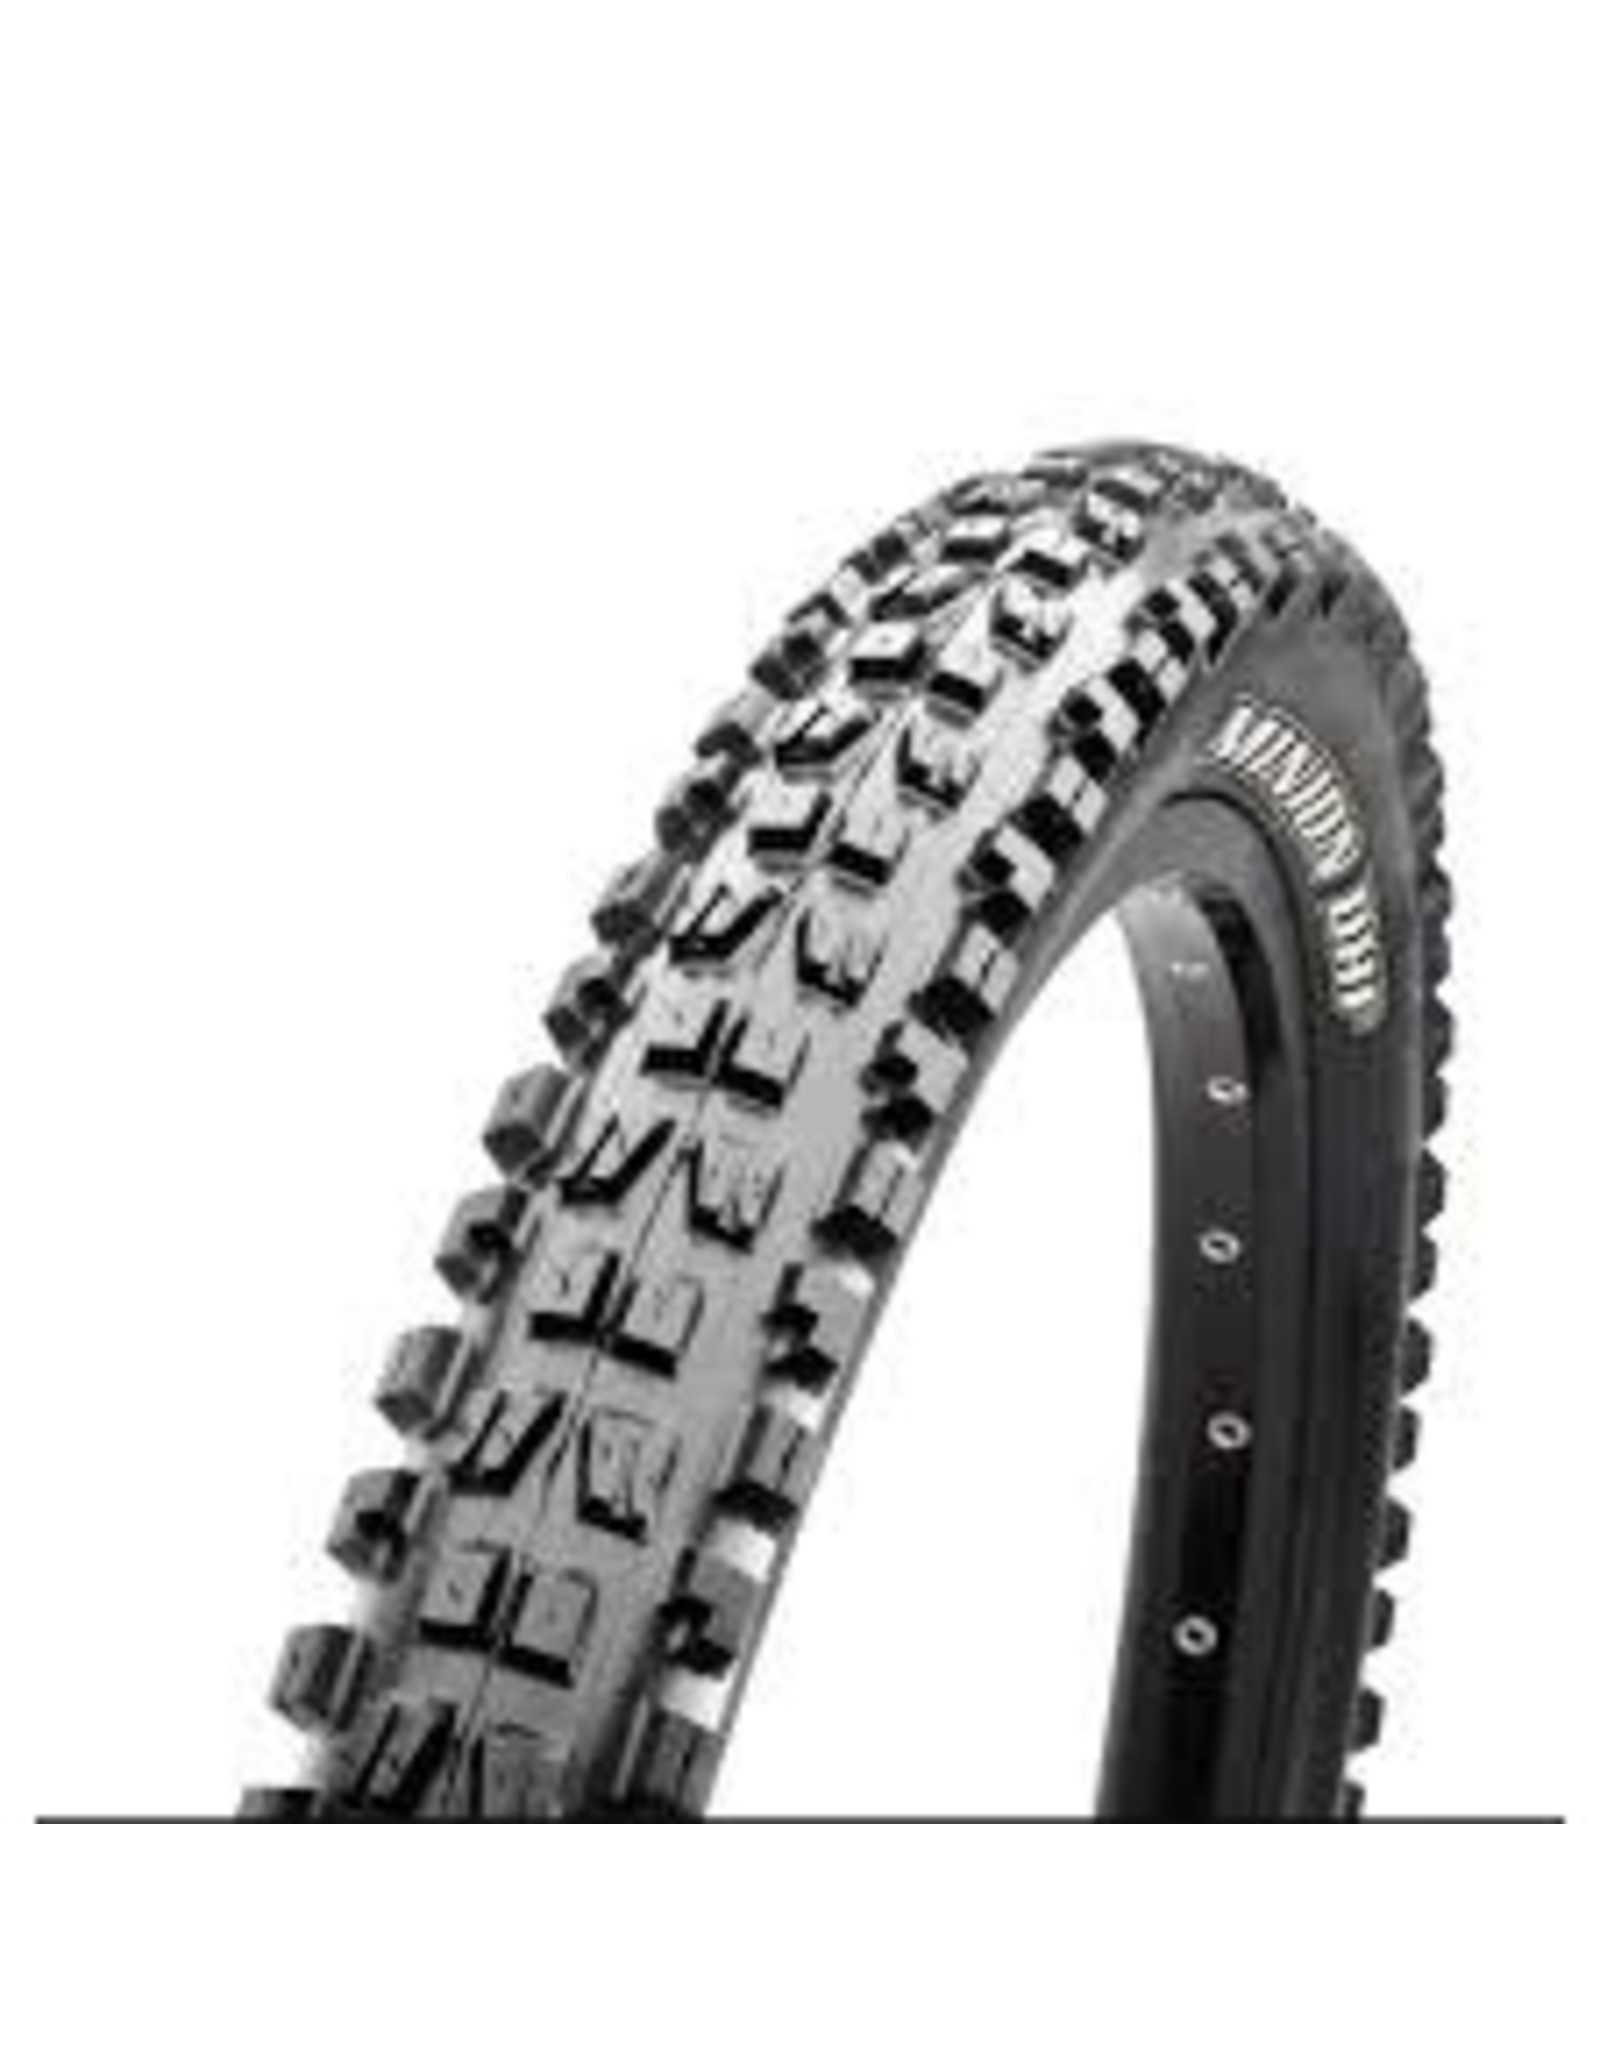 Maxxis Maxxis, Minion DHF, Tire, 27.5''x2.50, Folding, Tubeless Ready, 3C Maxx Grip, 2-ply, Wide Trail, 60TPI, Black